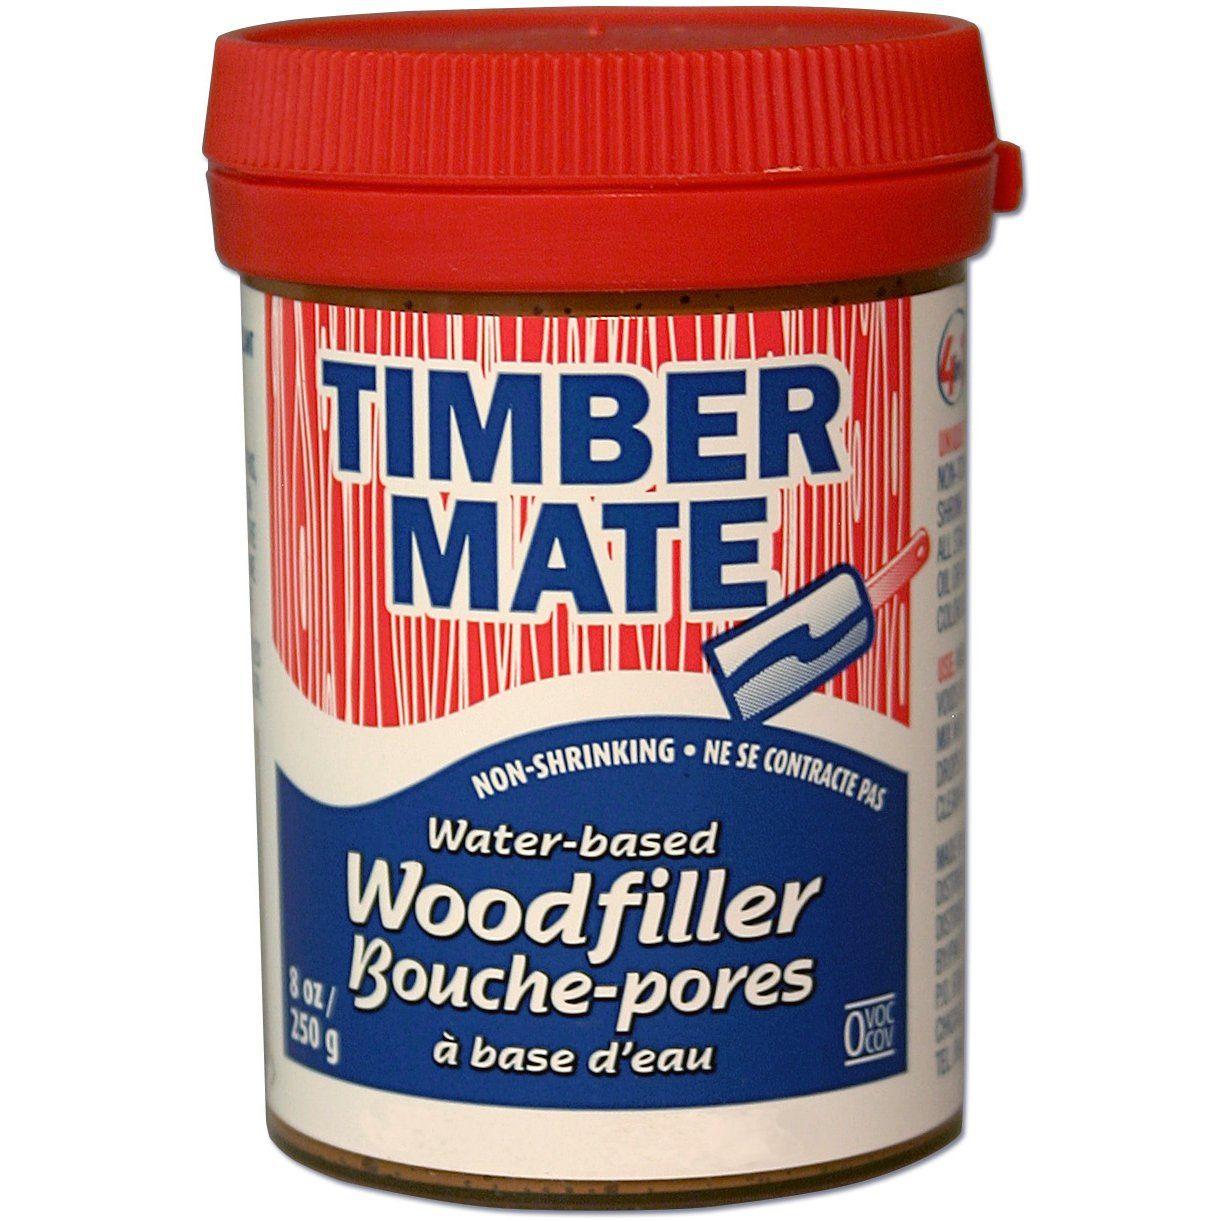 Timbermate Wood Filler Water Based Wood Filler New